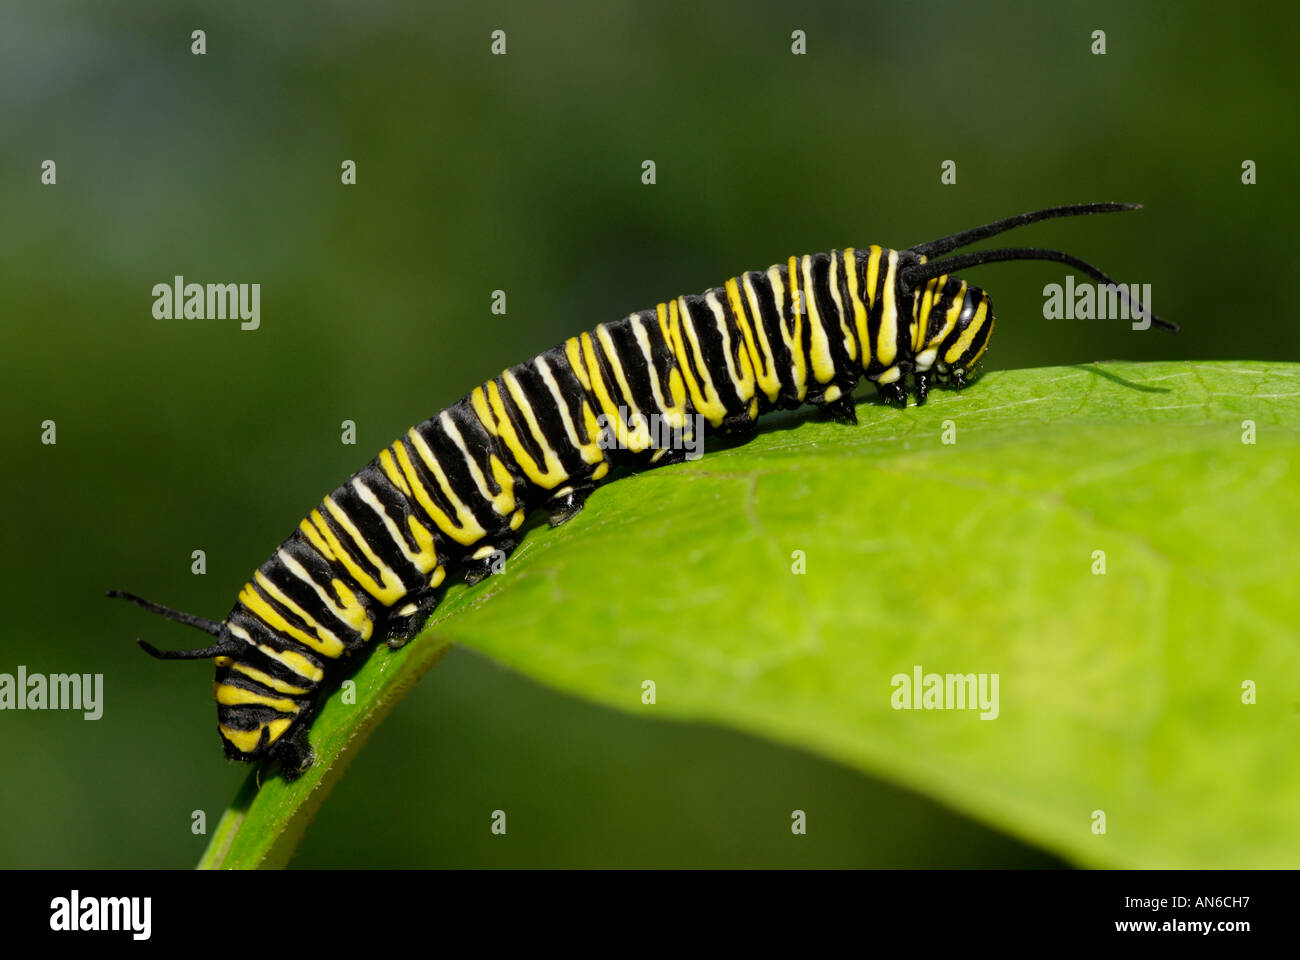 Monarch butterfly, Danaus plexippus, caterpillar on a milkweed, Asclepias sp., leaf - Stock Image